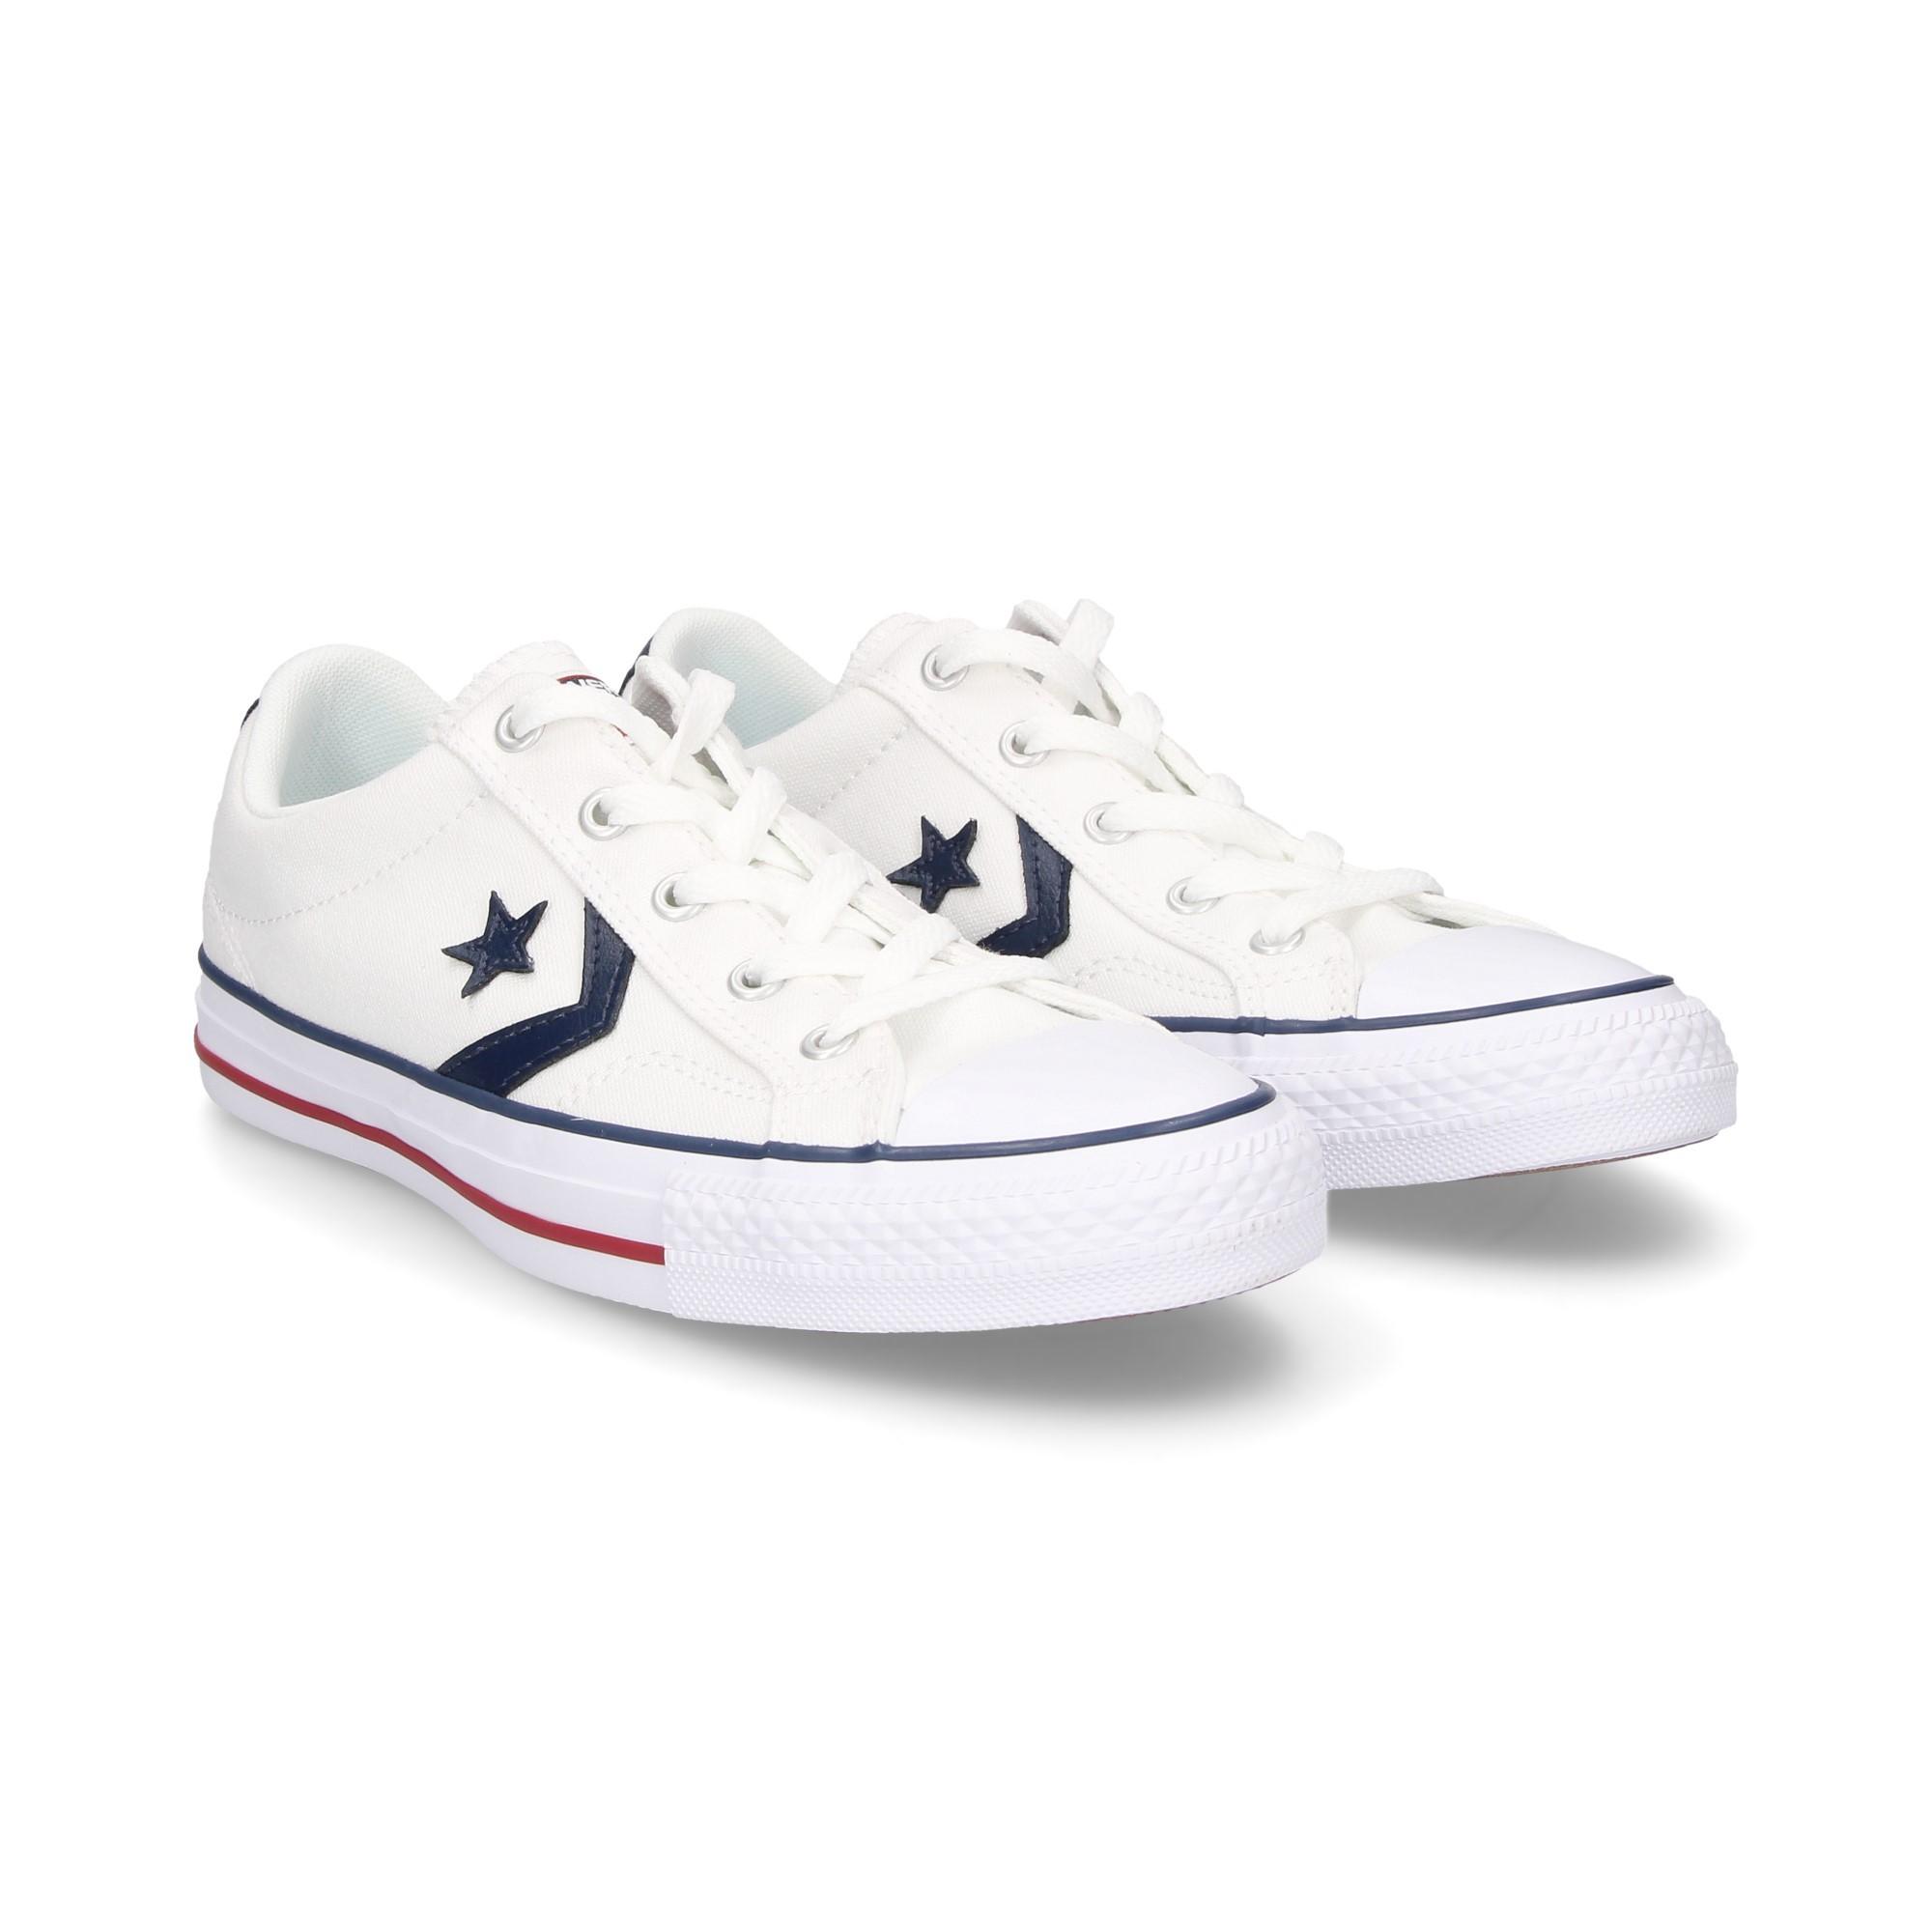 0ceb6c4128af CONVERSE Men s sneakers 144151C BLANCO